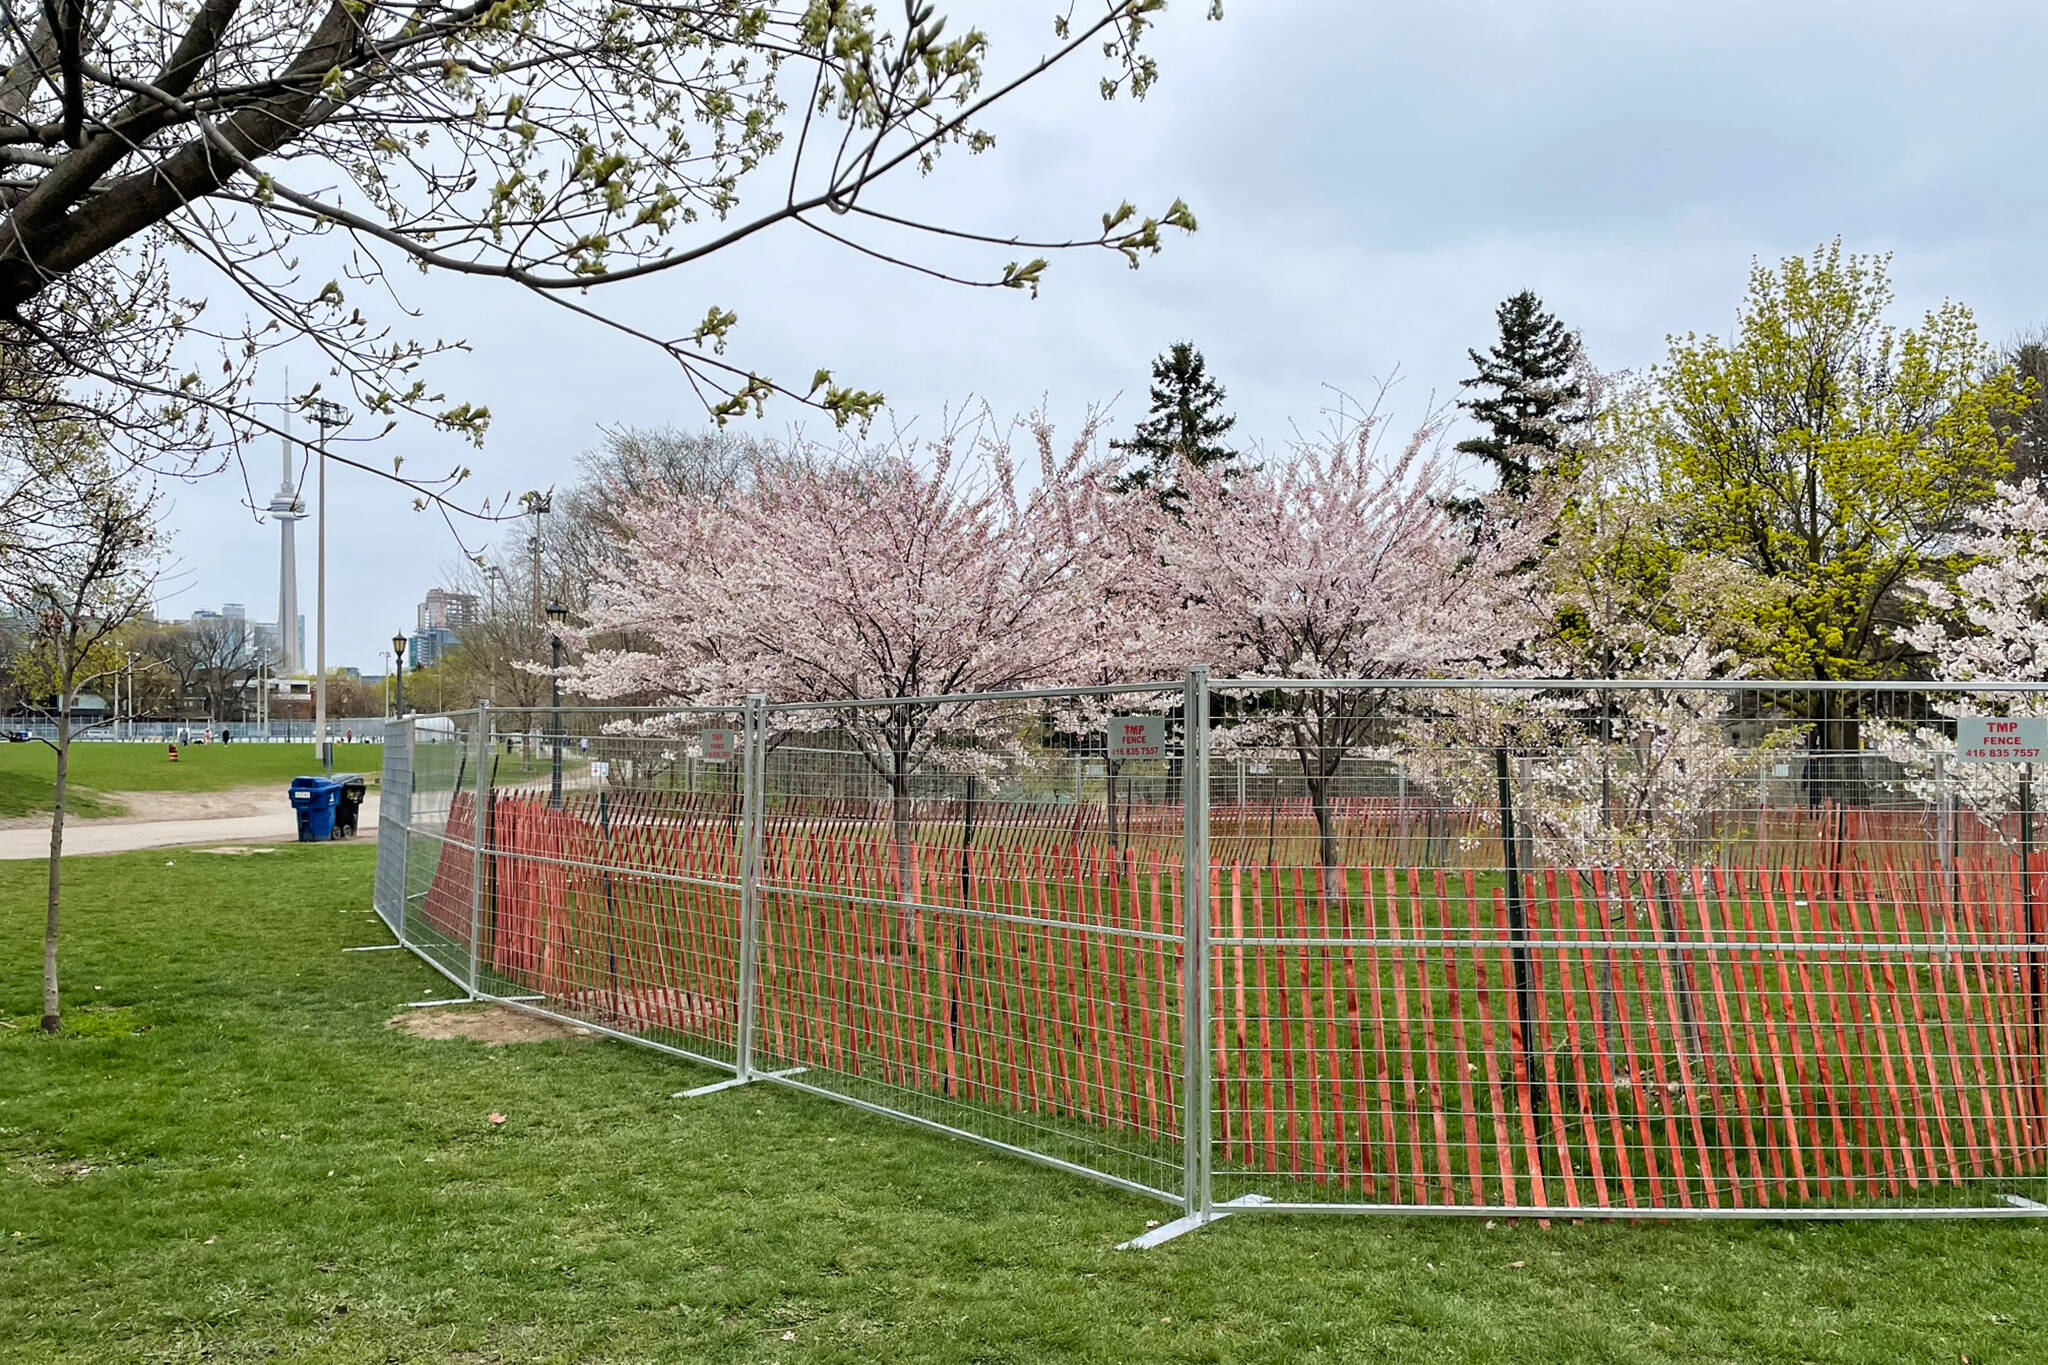 toronto cherry blossoms 2021